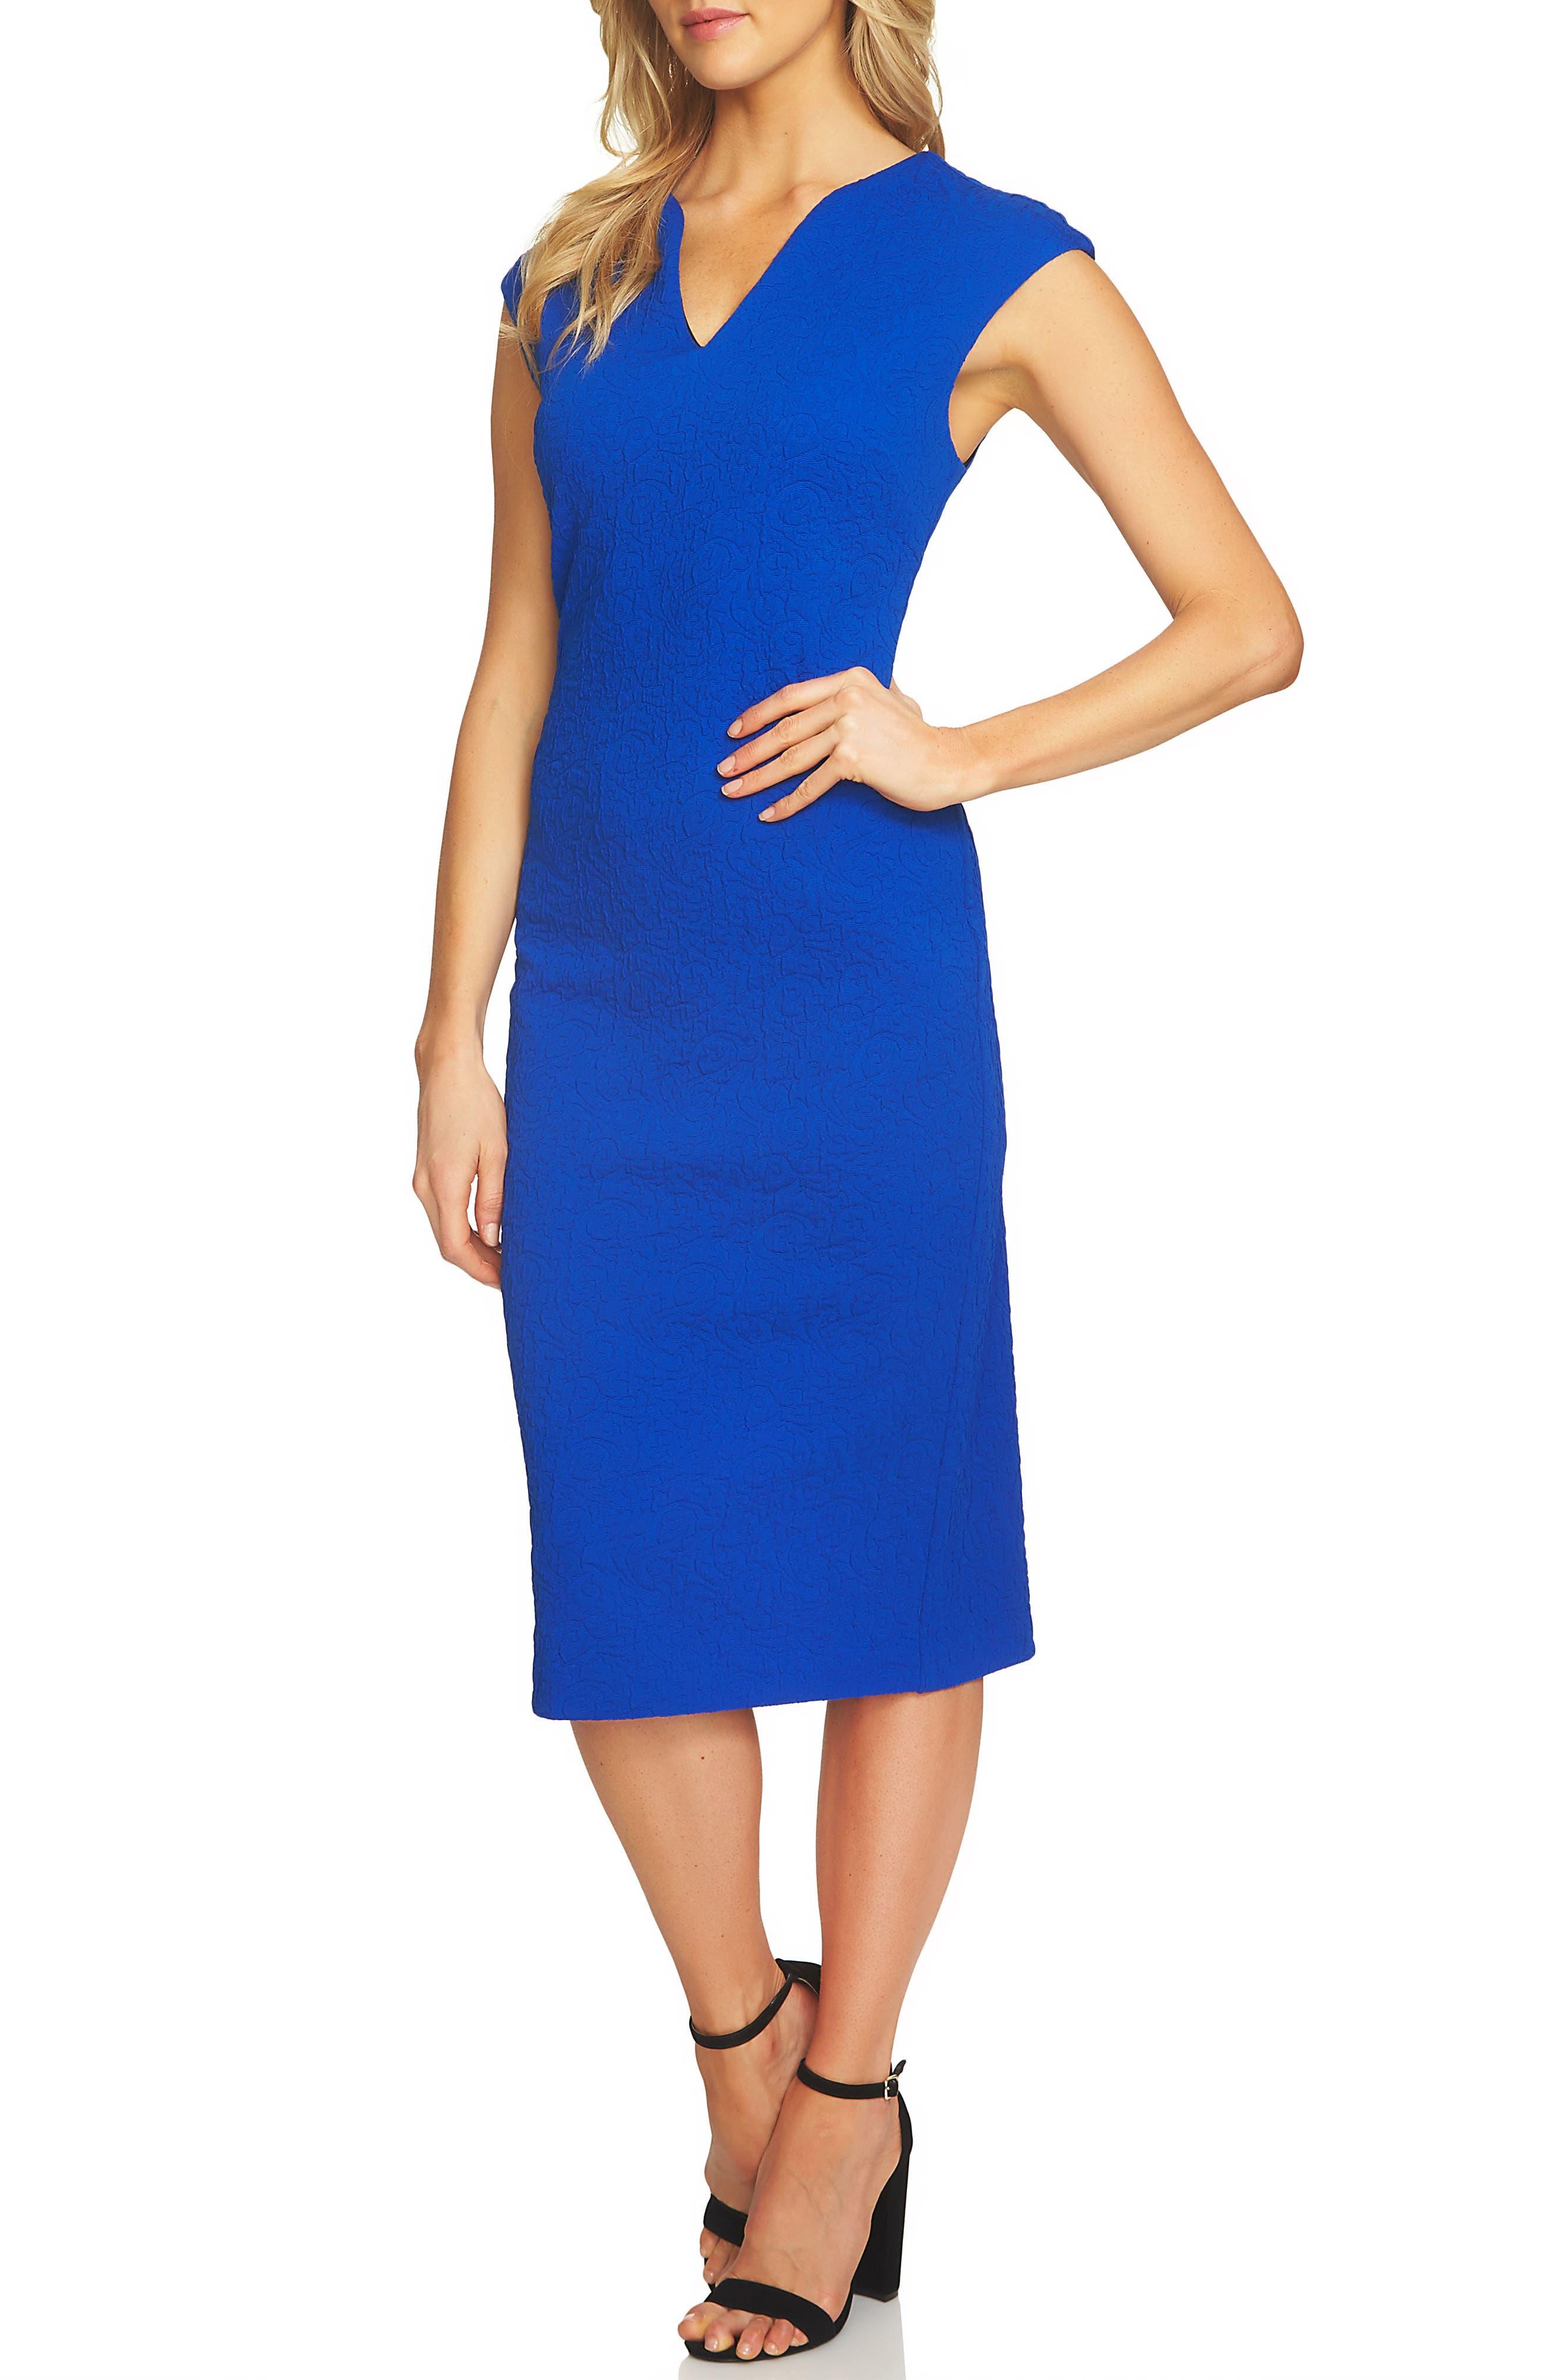 Alternate Image 1 Selected - CeCe Paisley Jacquard Sheath Dress